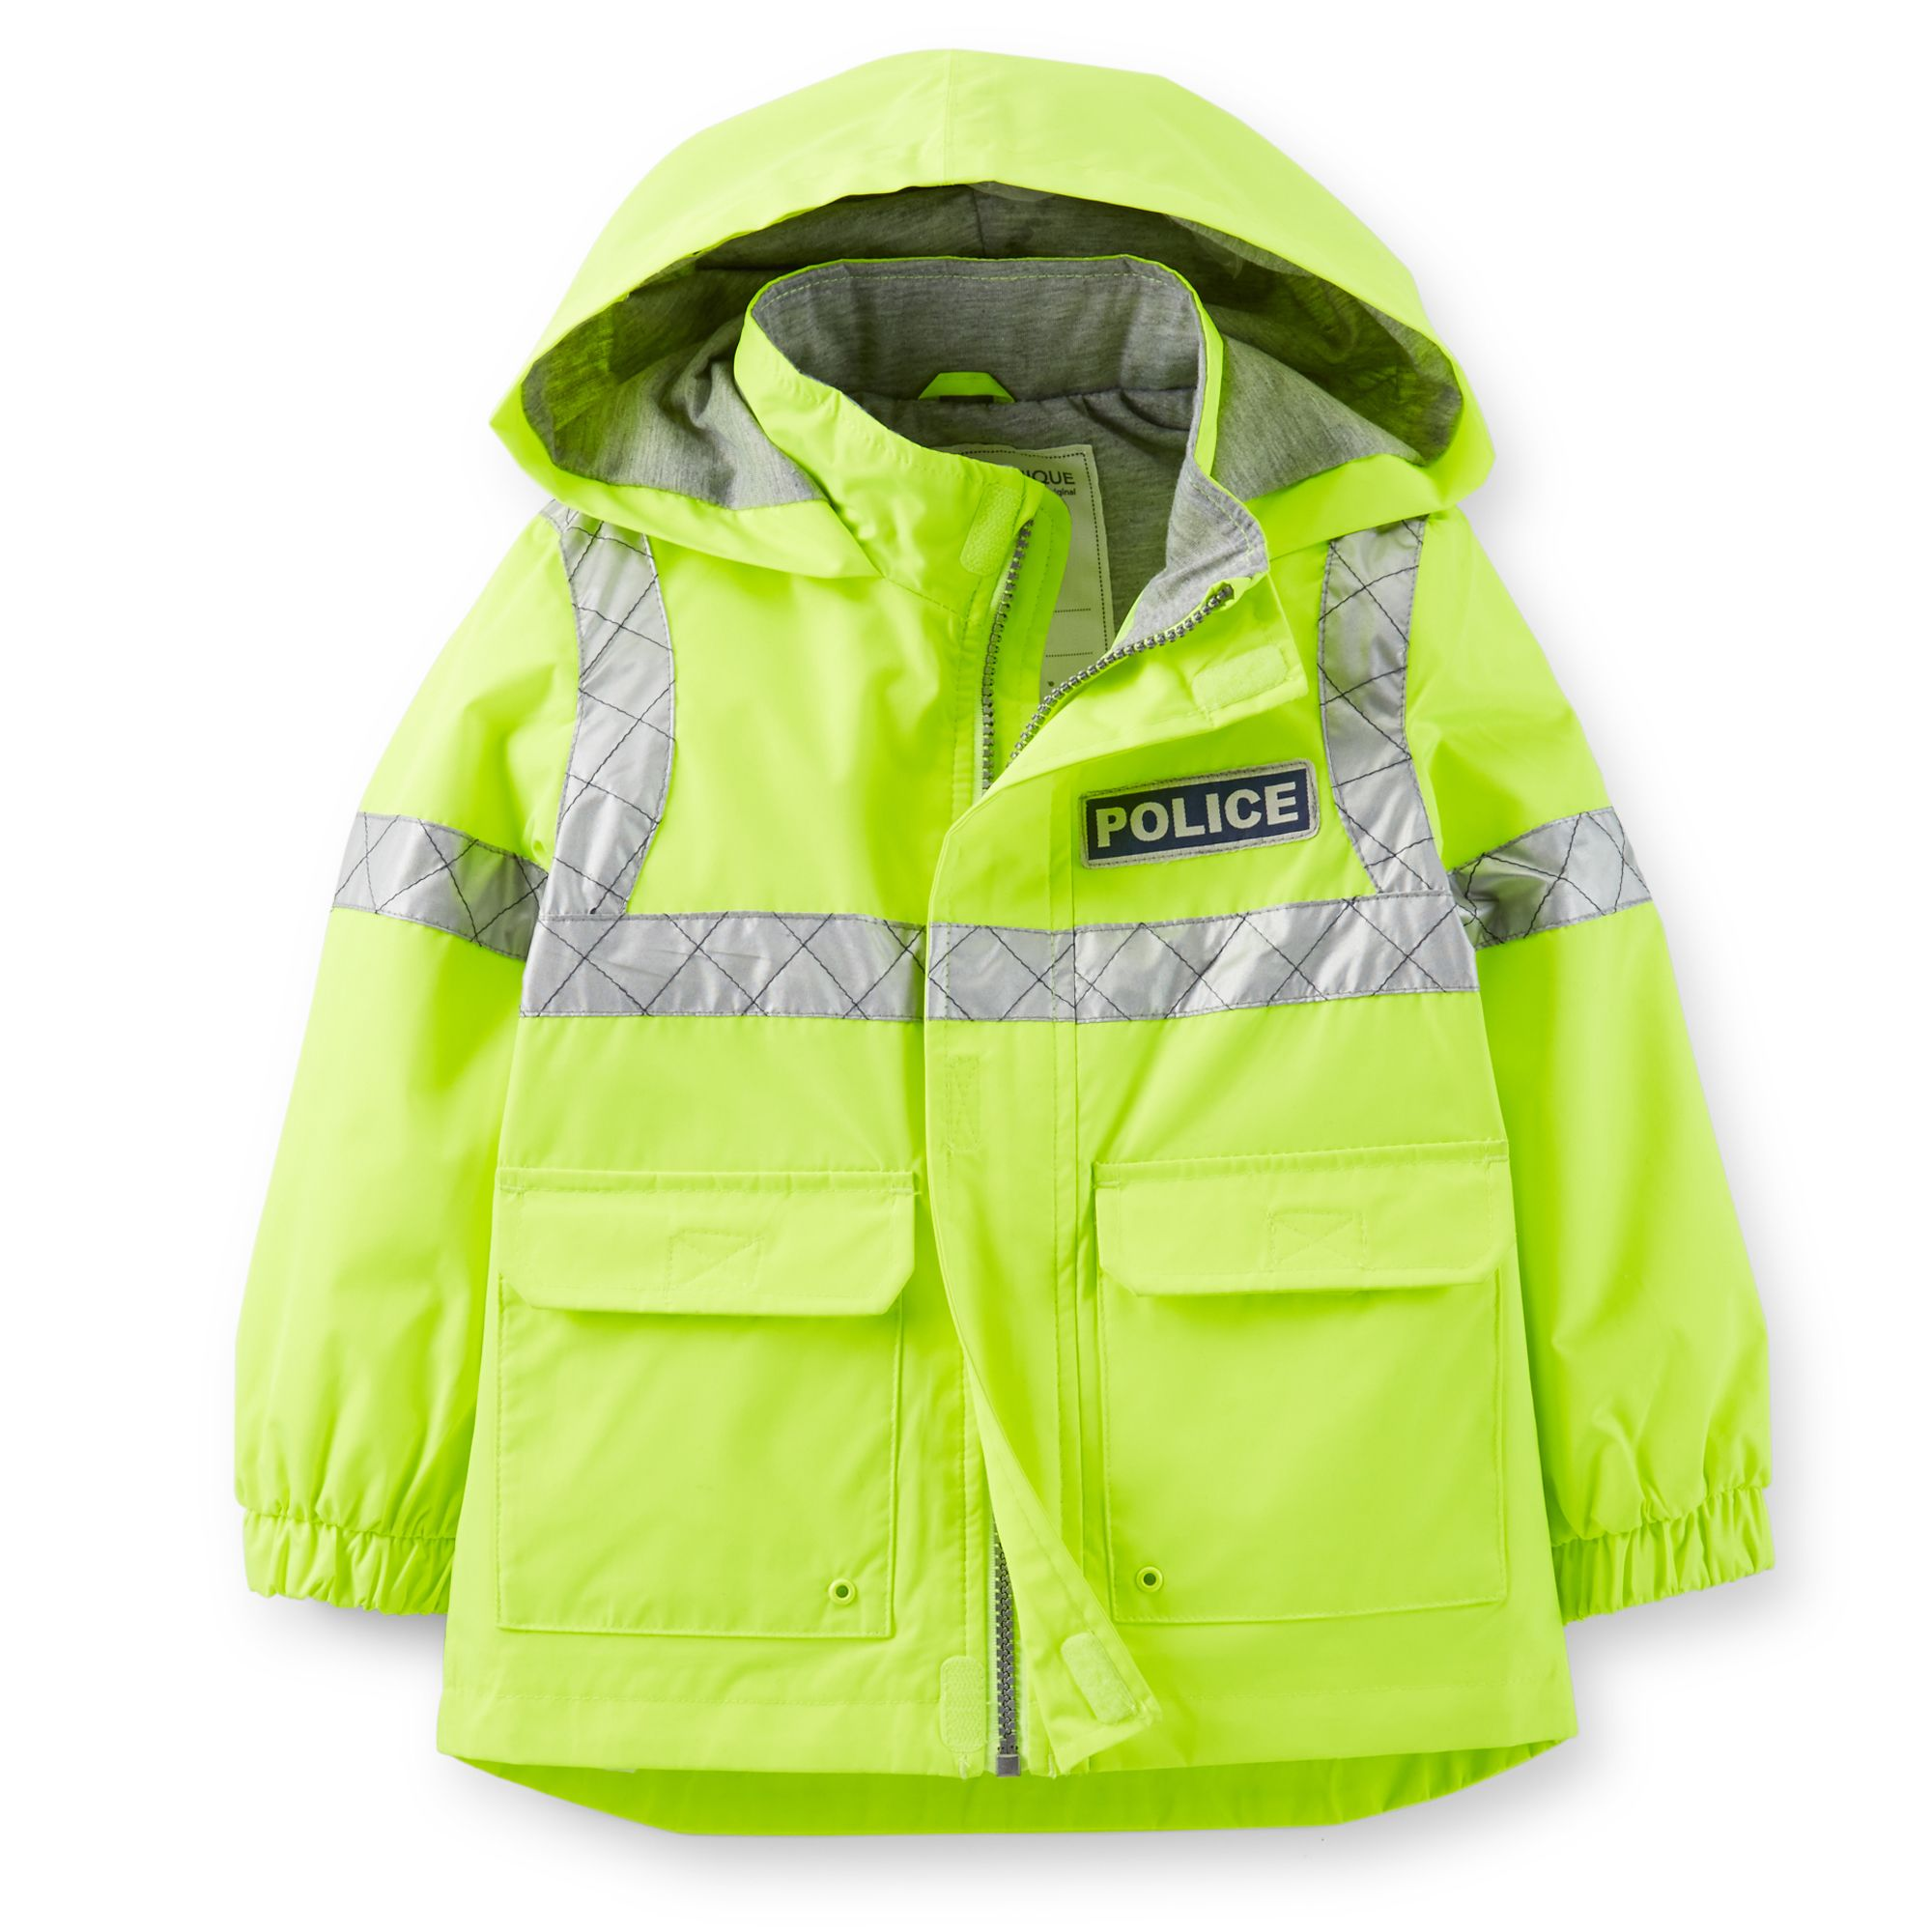 cfea6faf9101 police rain jacket